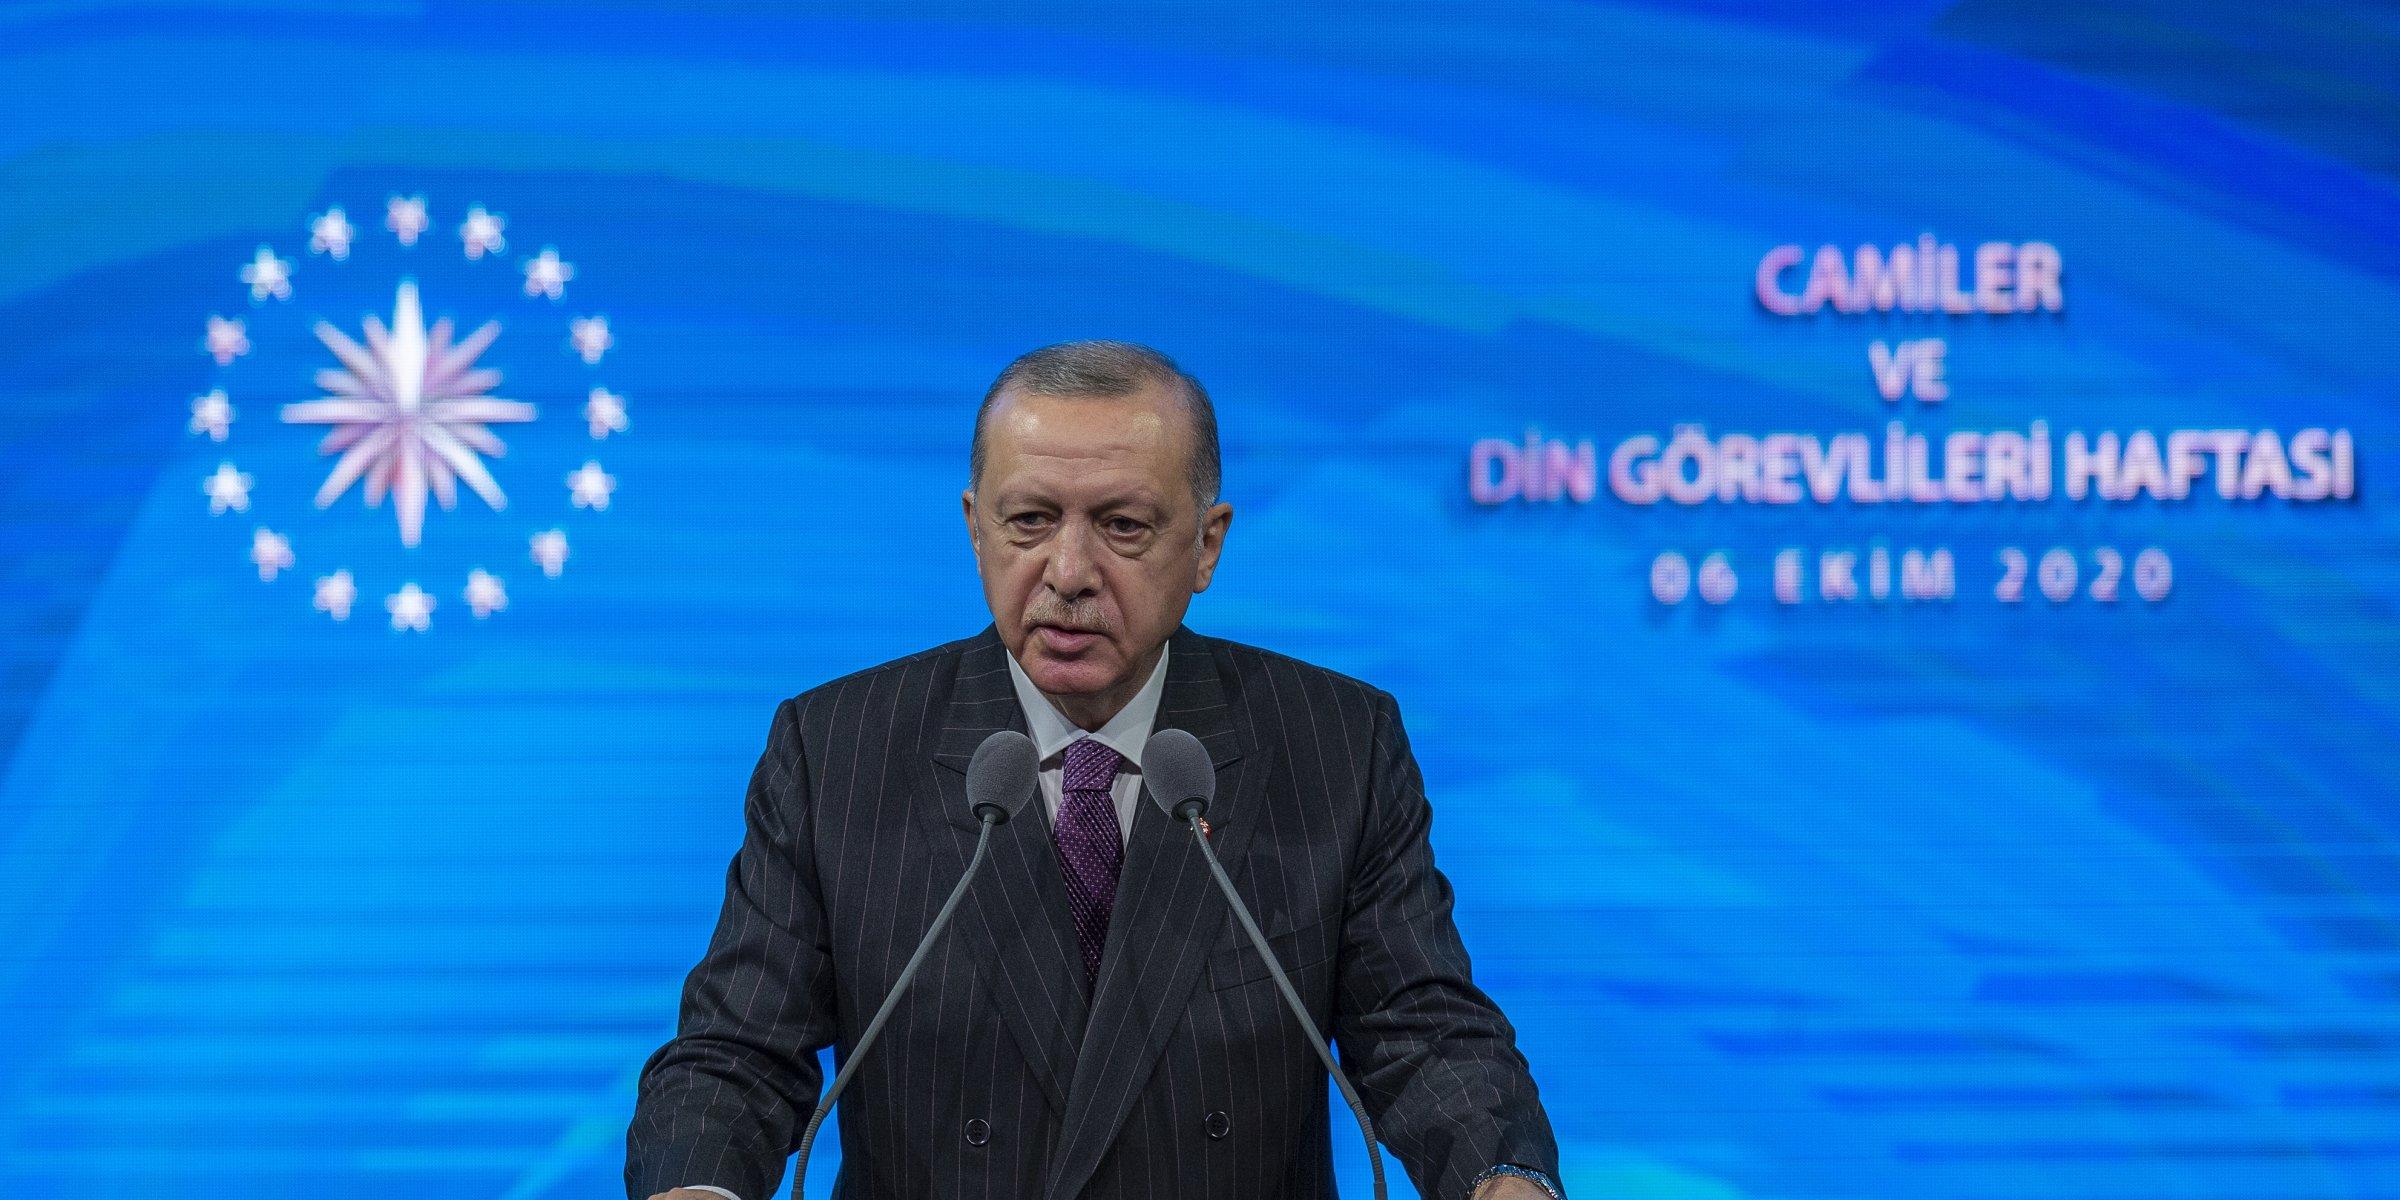 Macron's remarks on Islam 'provocation', Erdoğan says | Daily Sabah